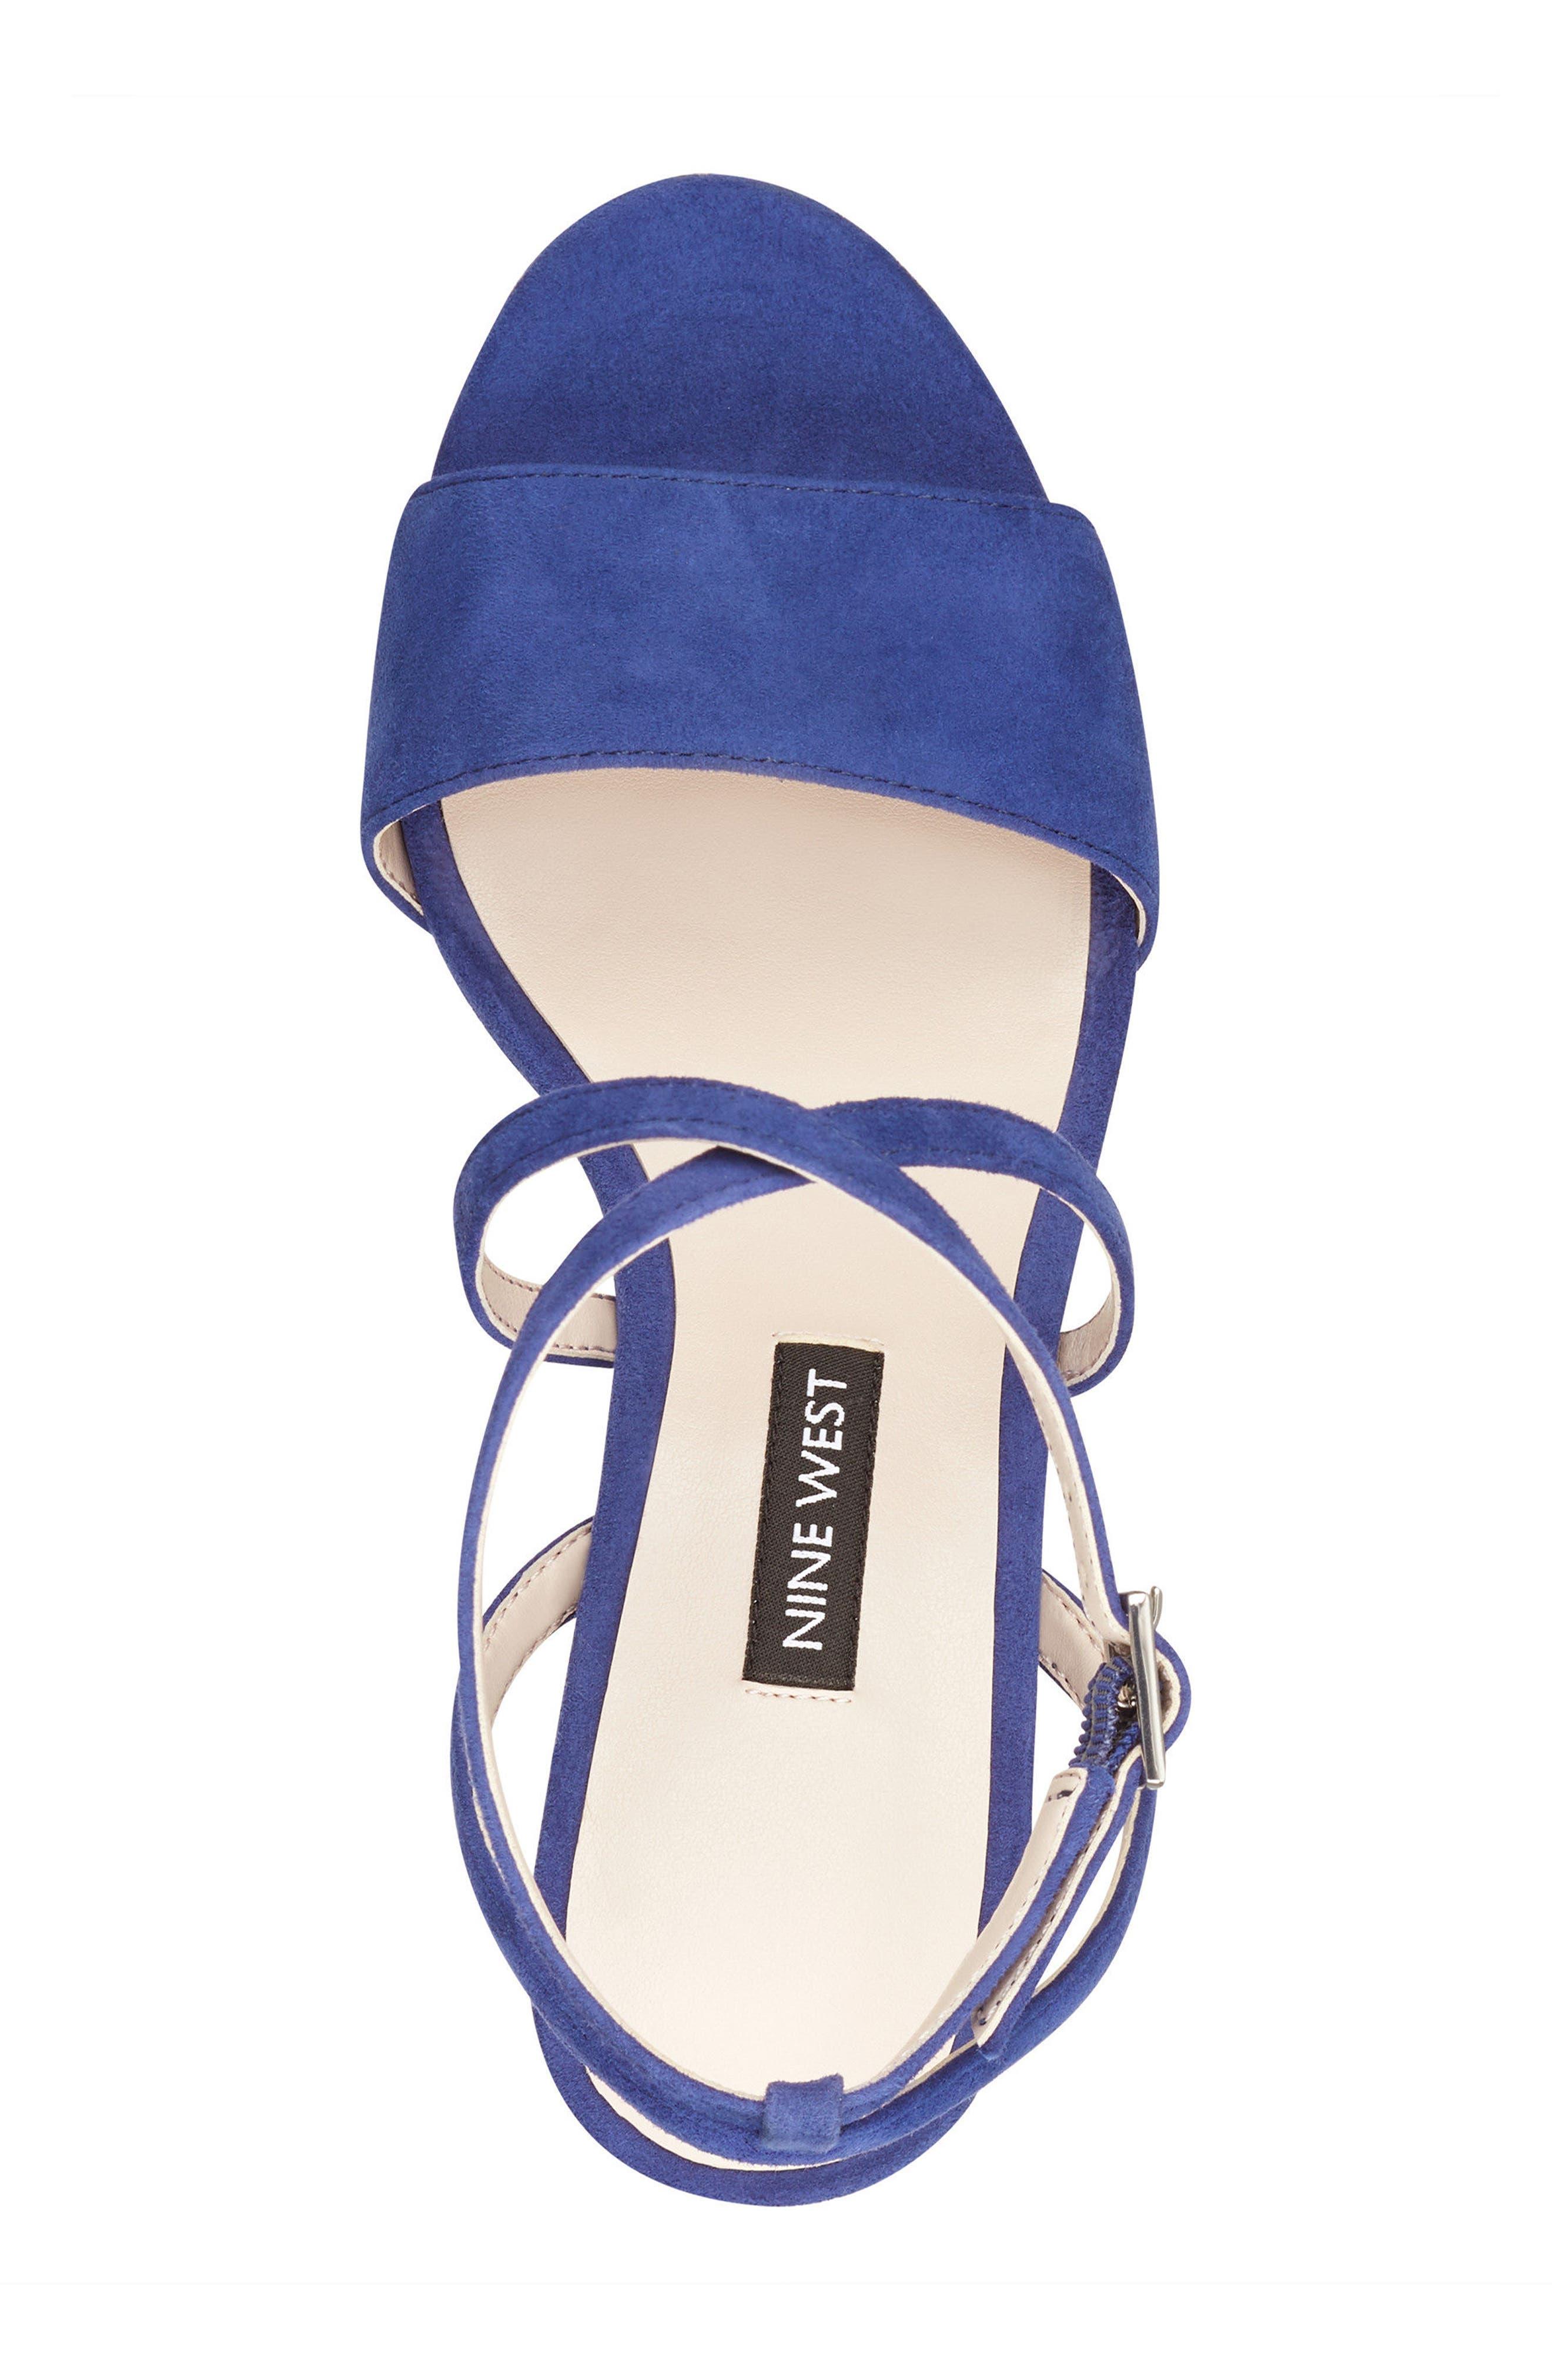 Markando Platform Sandal,                             Alternate thumbnail 5, color,                             Dark Blue Suede